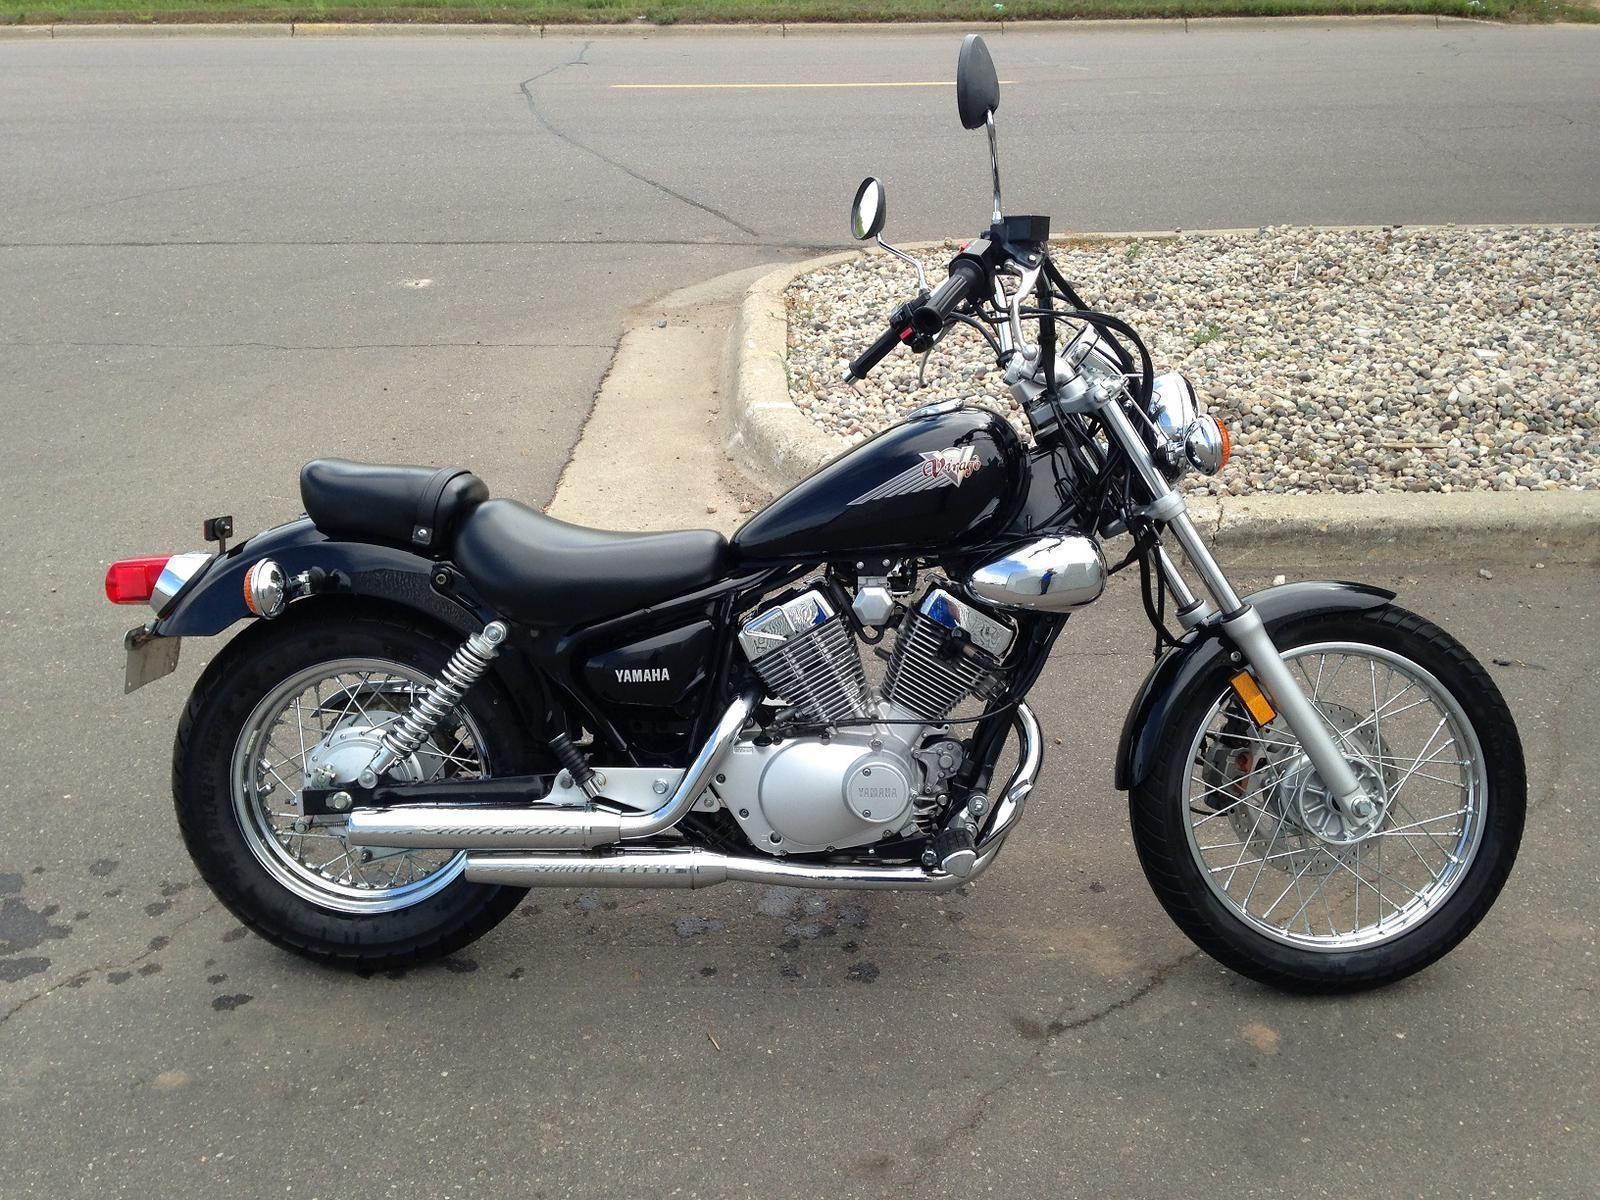 yamaha virago 250 moto yamaha virago motorcycle a yamaha. Black Bedroom Furniture Sets. Home Design Ideas